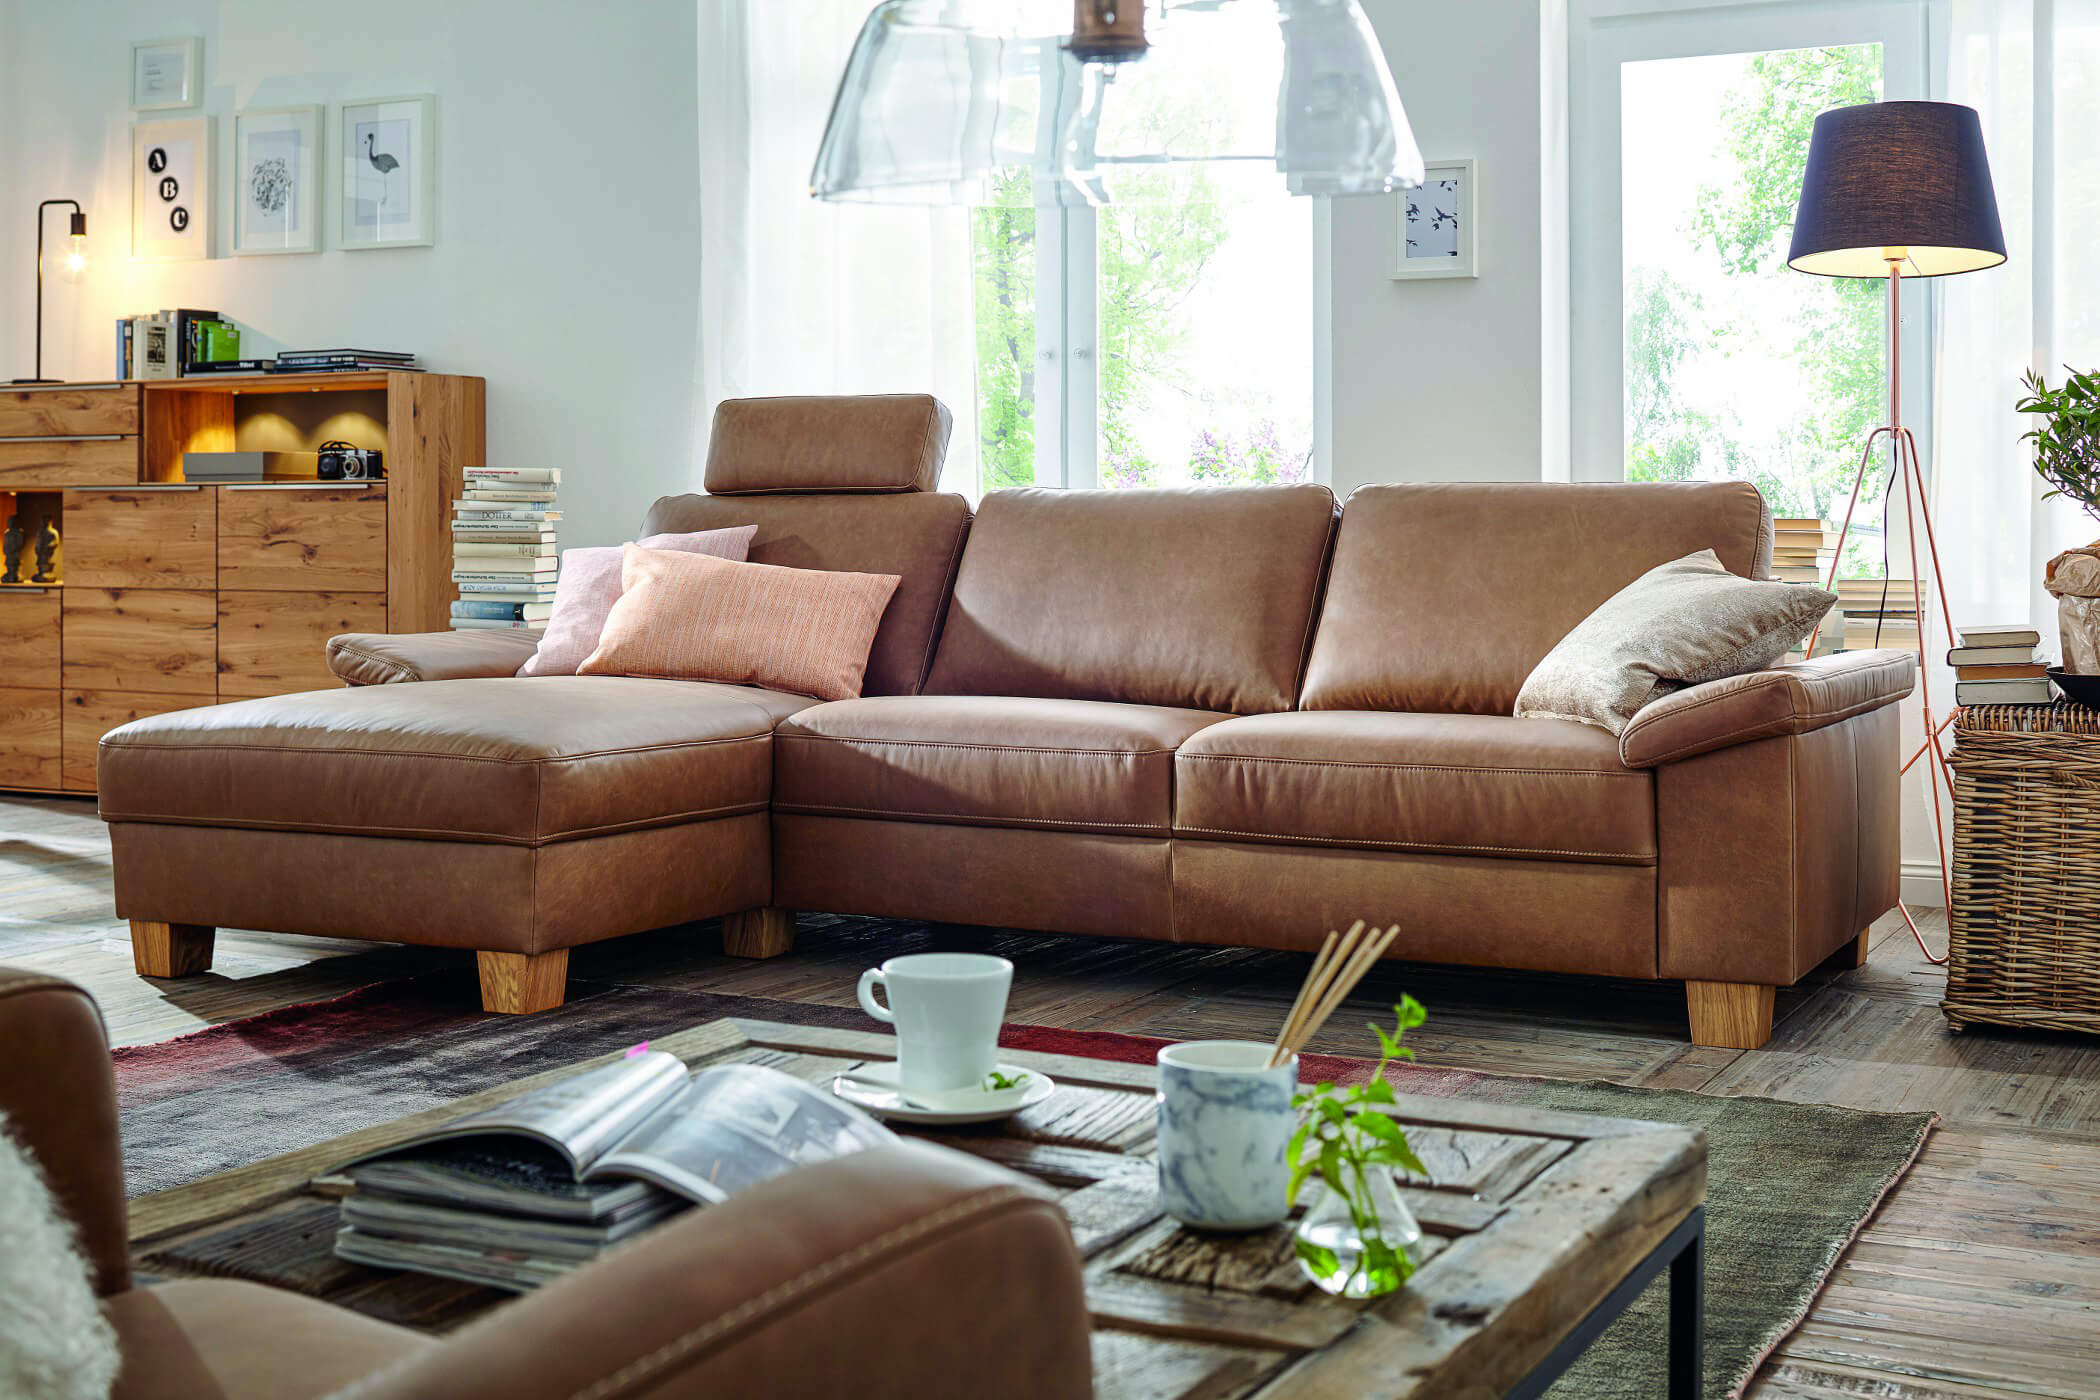 Full Size of Sofa Natura Livingston Couch Denver Kansas Newport Home Gebraucht Kaufen Brooklyn Innatura Massivholzmbel Naturholzmbel Kleines Wohnzimmer Machalke Kissen Sofa Natura Sofa